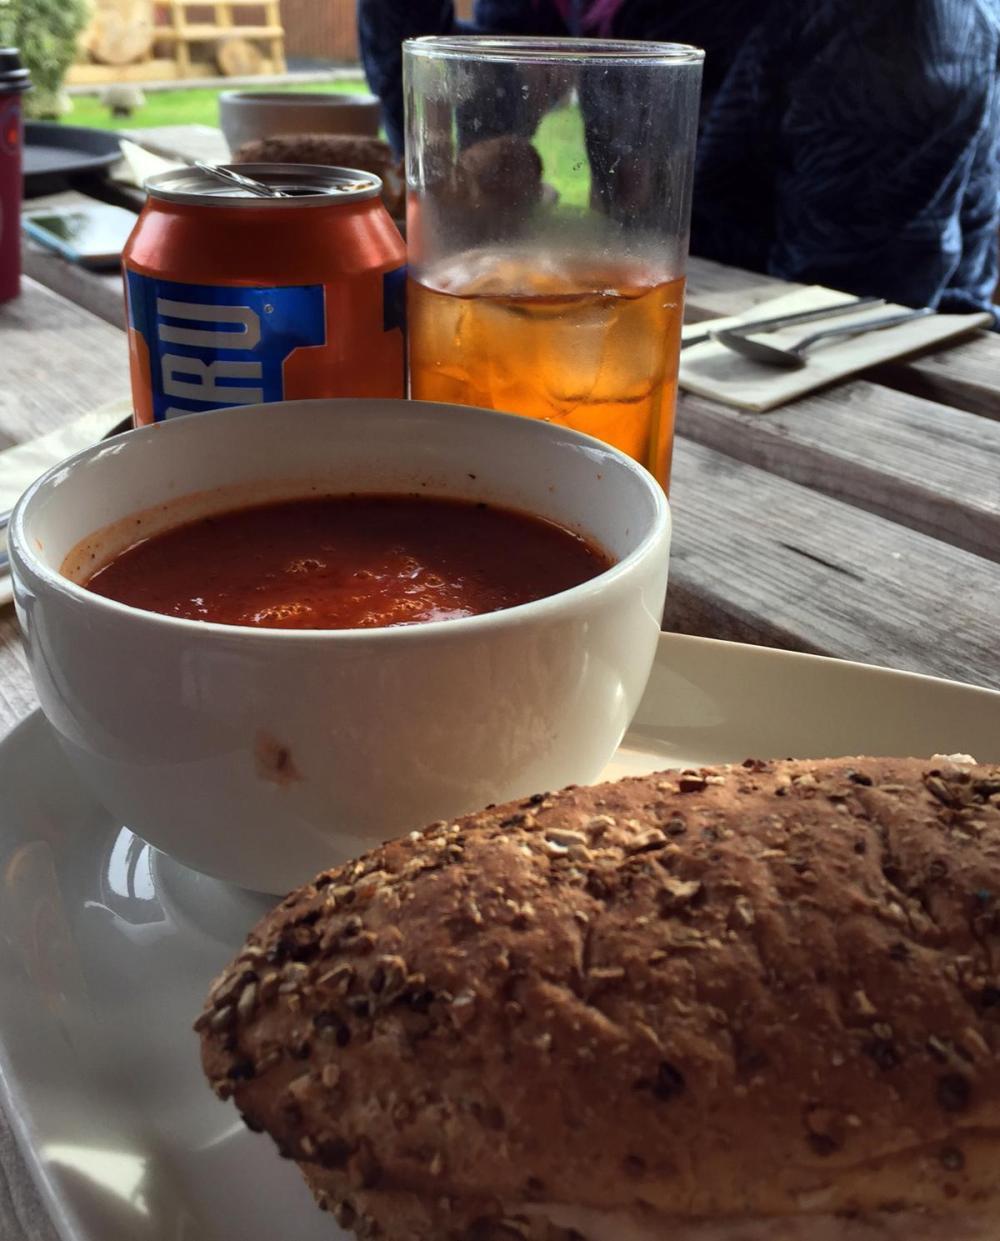 Splodz Blogz | Soup and a Sandwich at the Beech Tree Inn